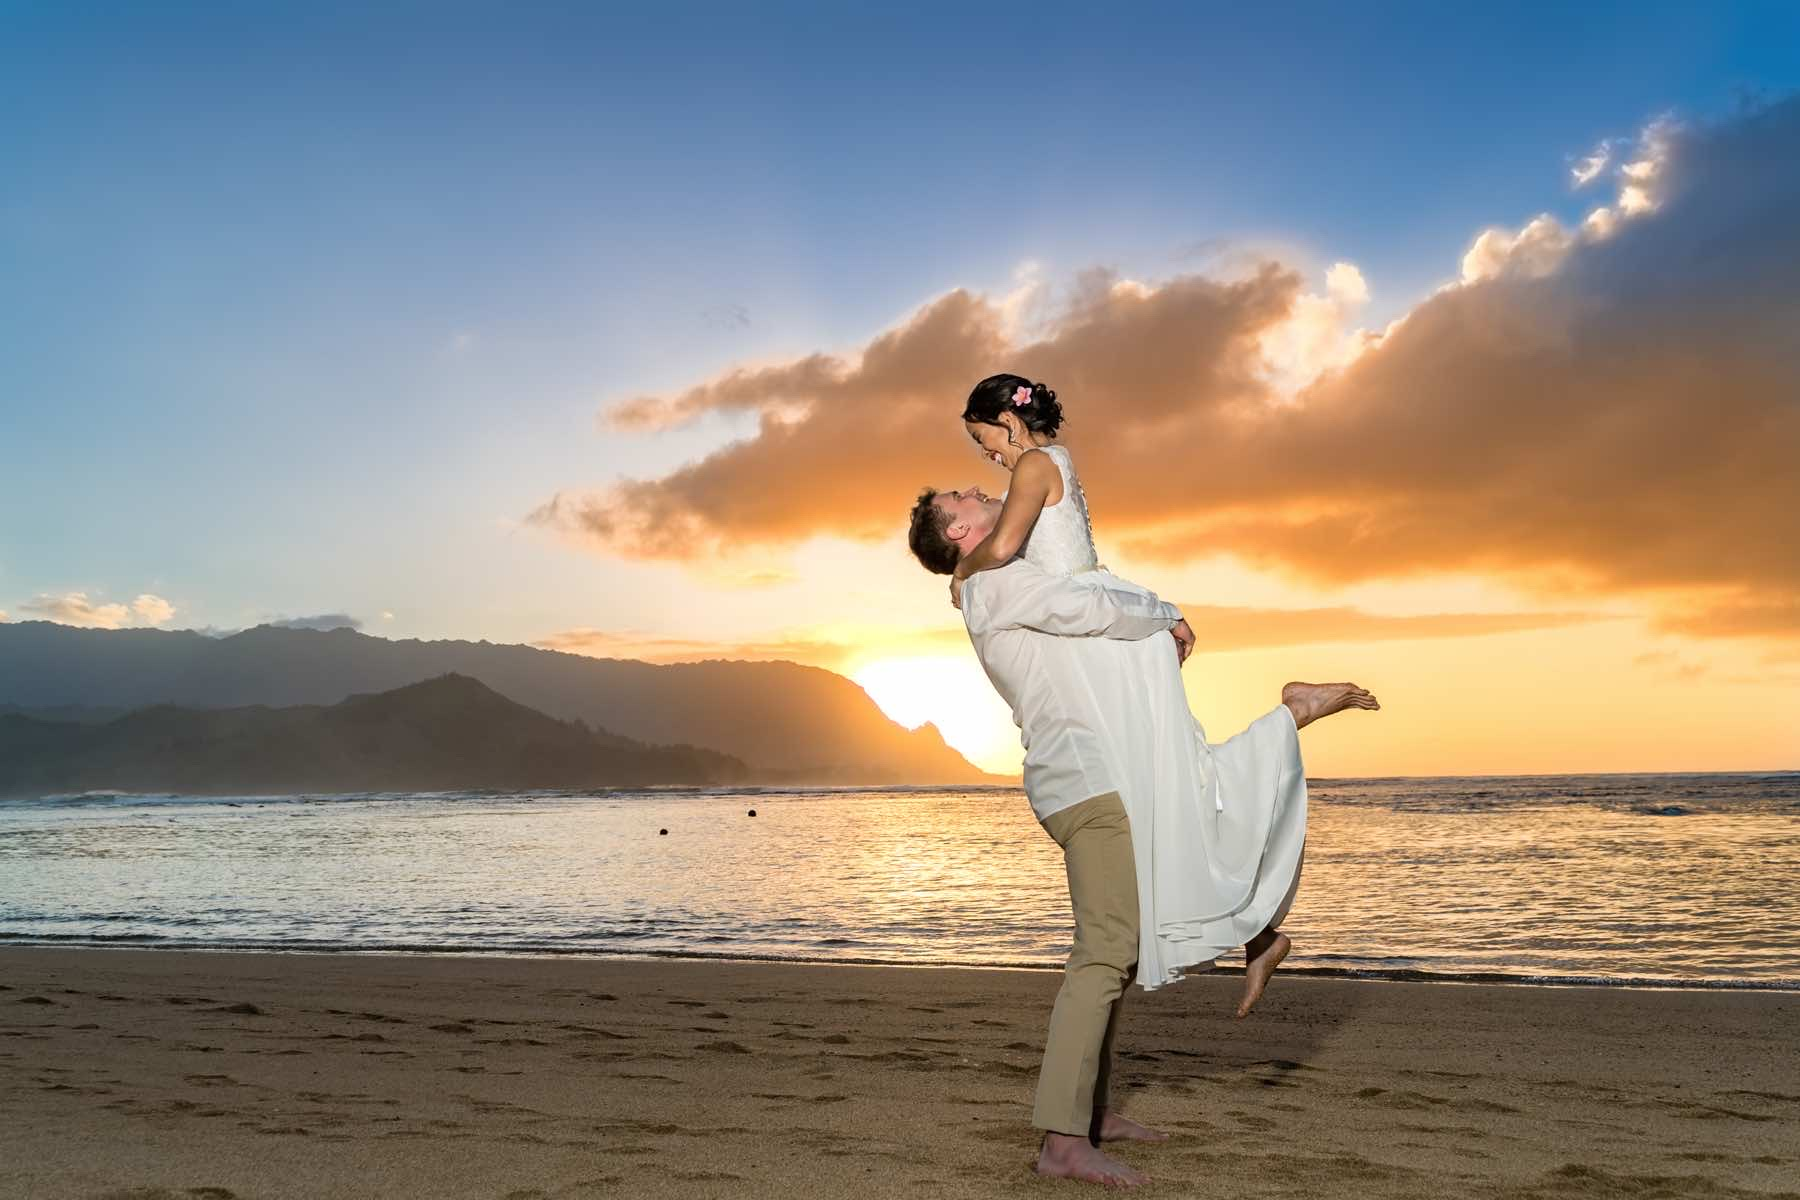 Lauren and Lars on their wedding day in Kauai.